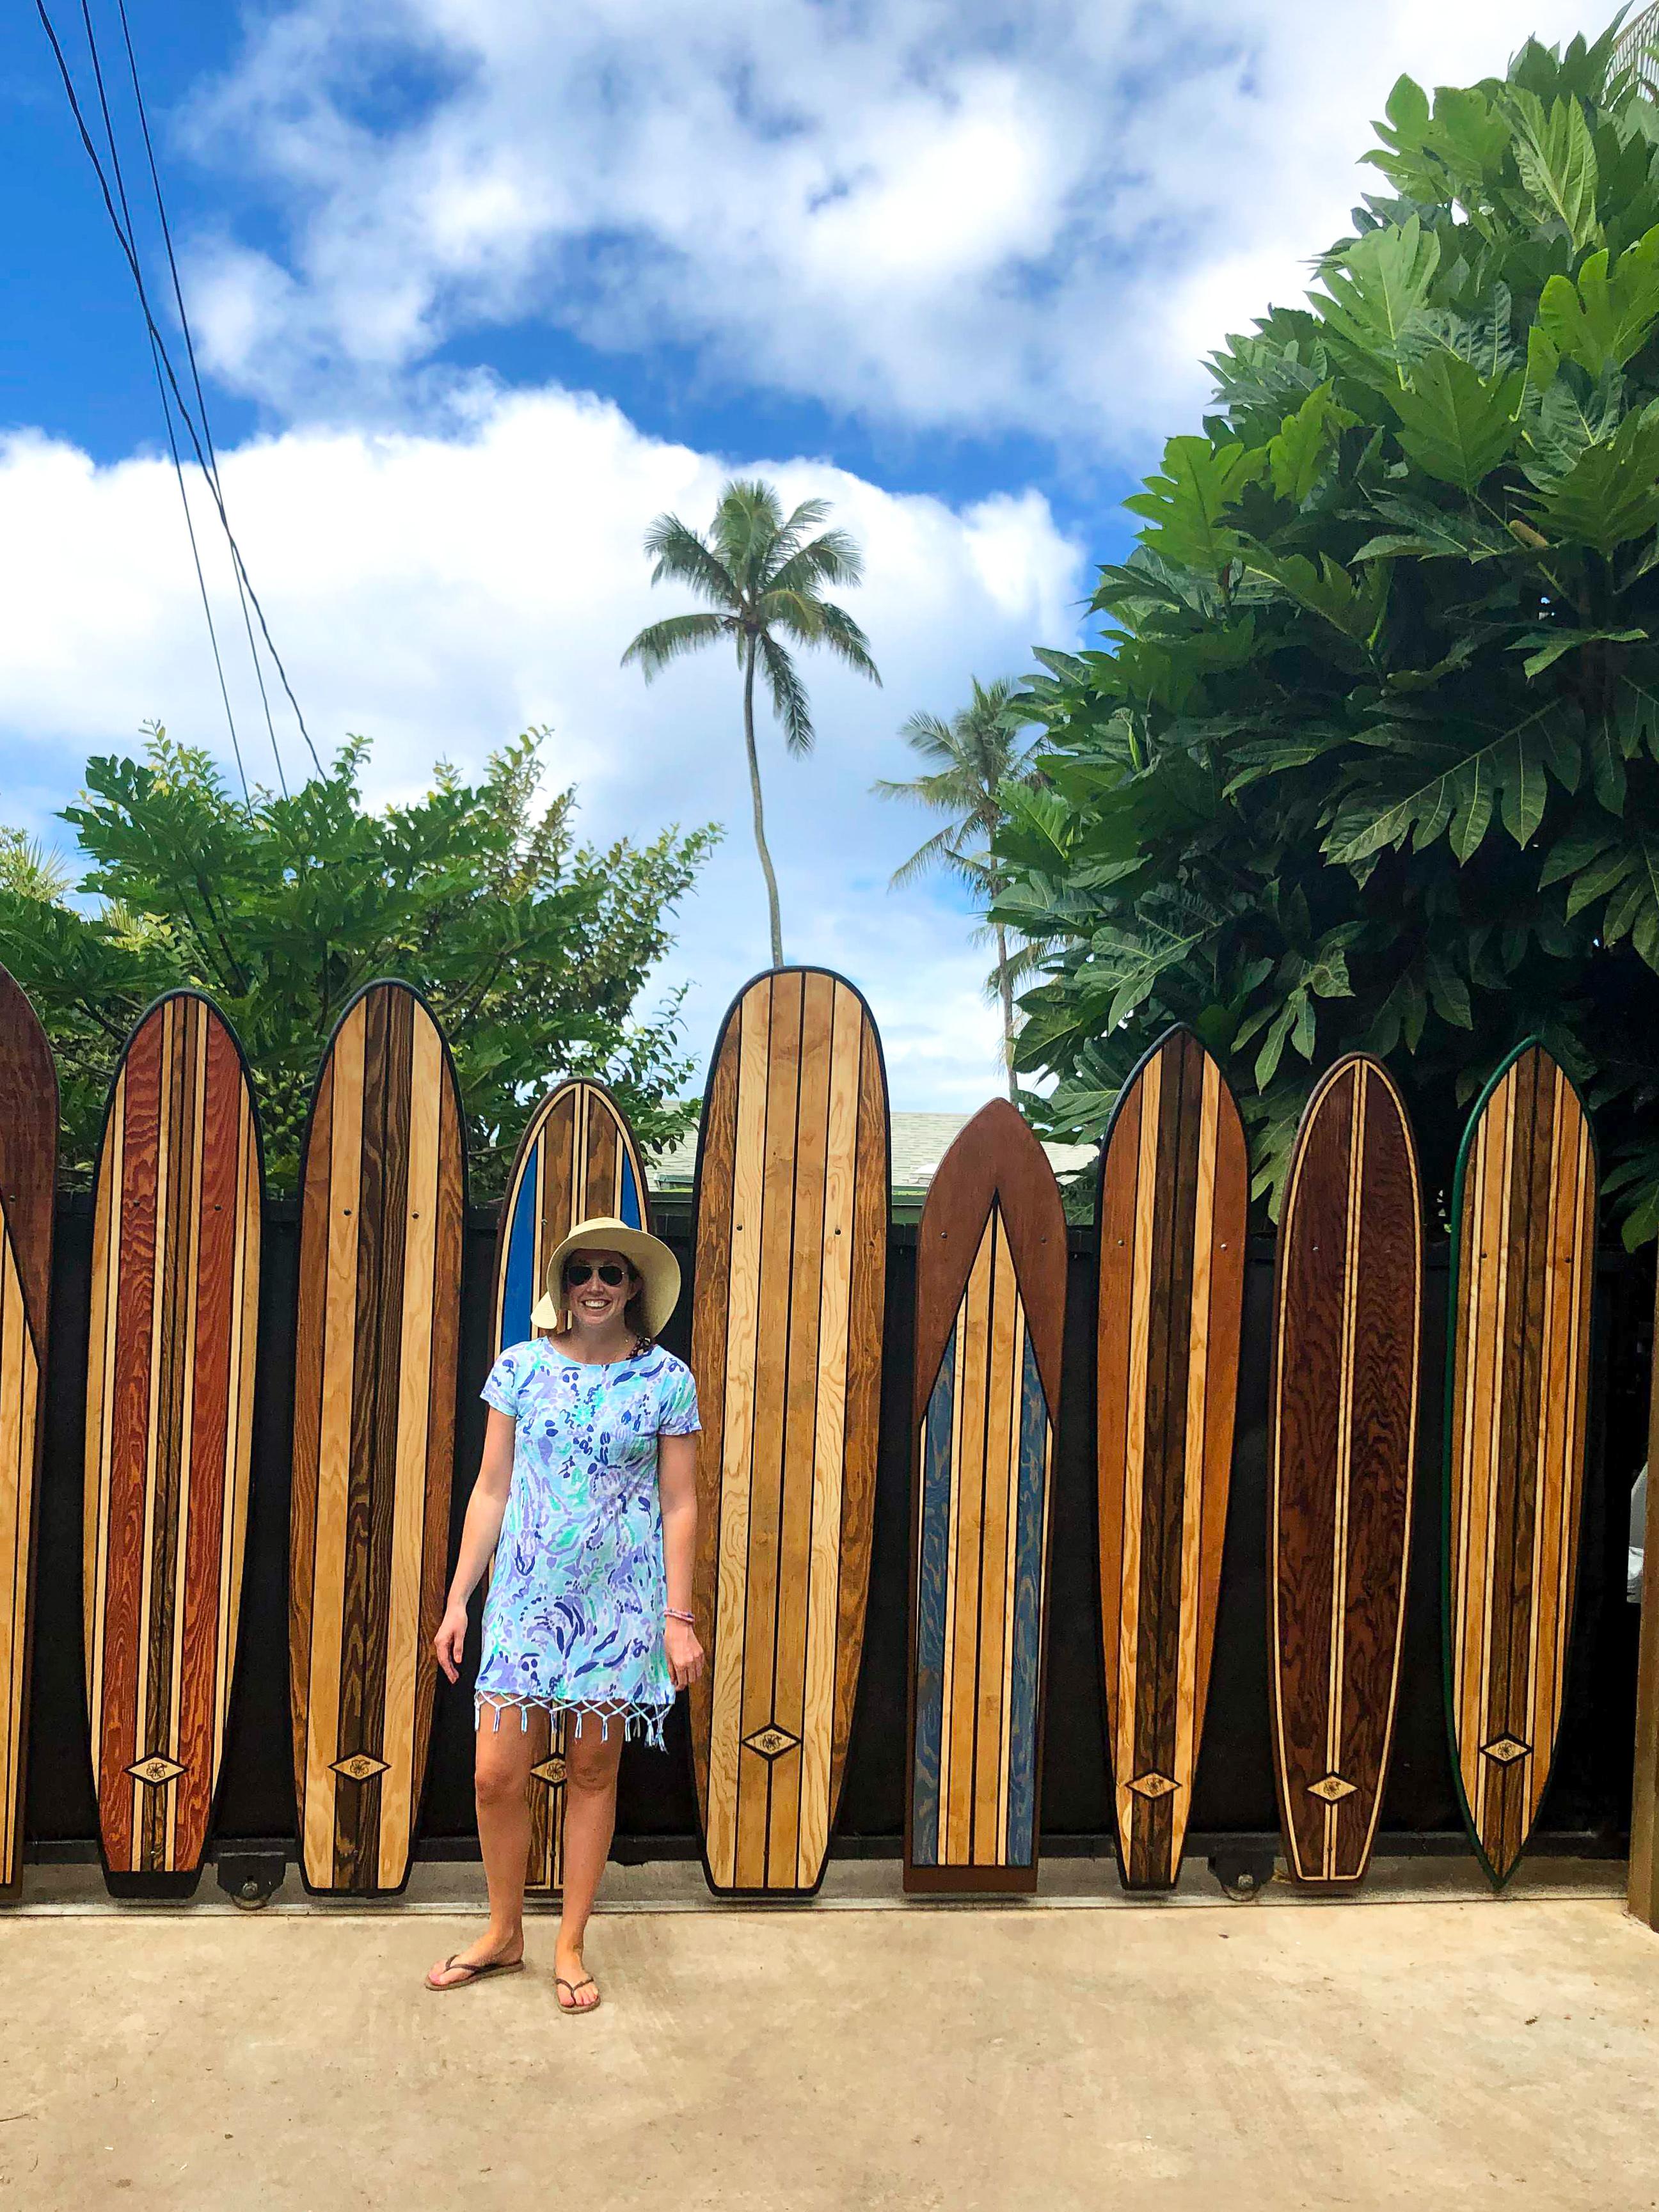 Surfboard Gate North Shore Oahu